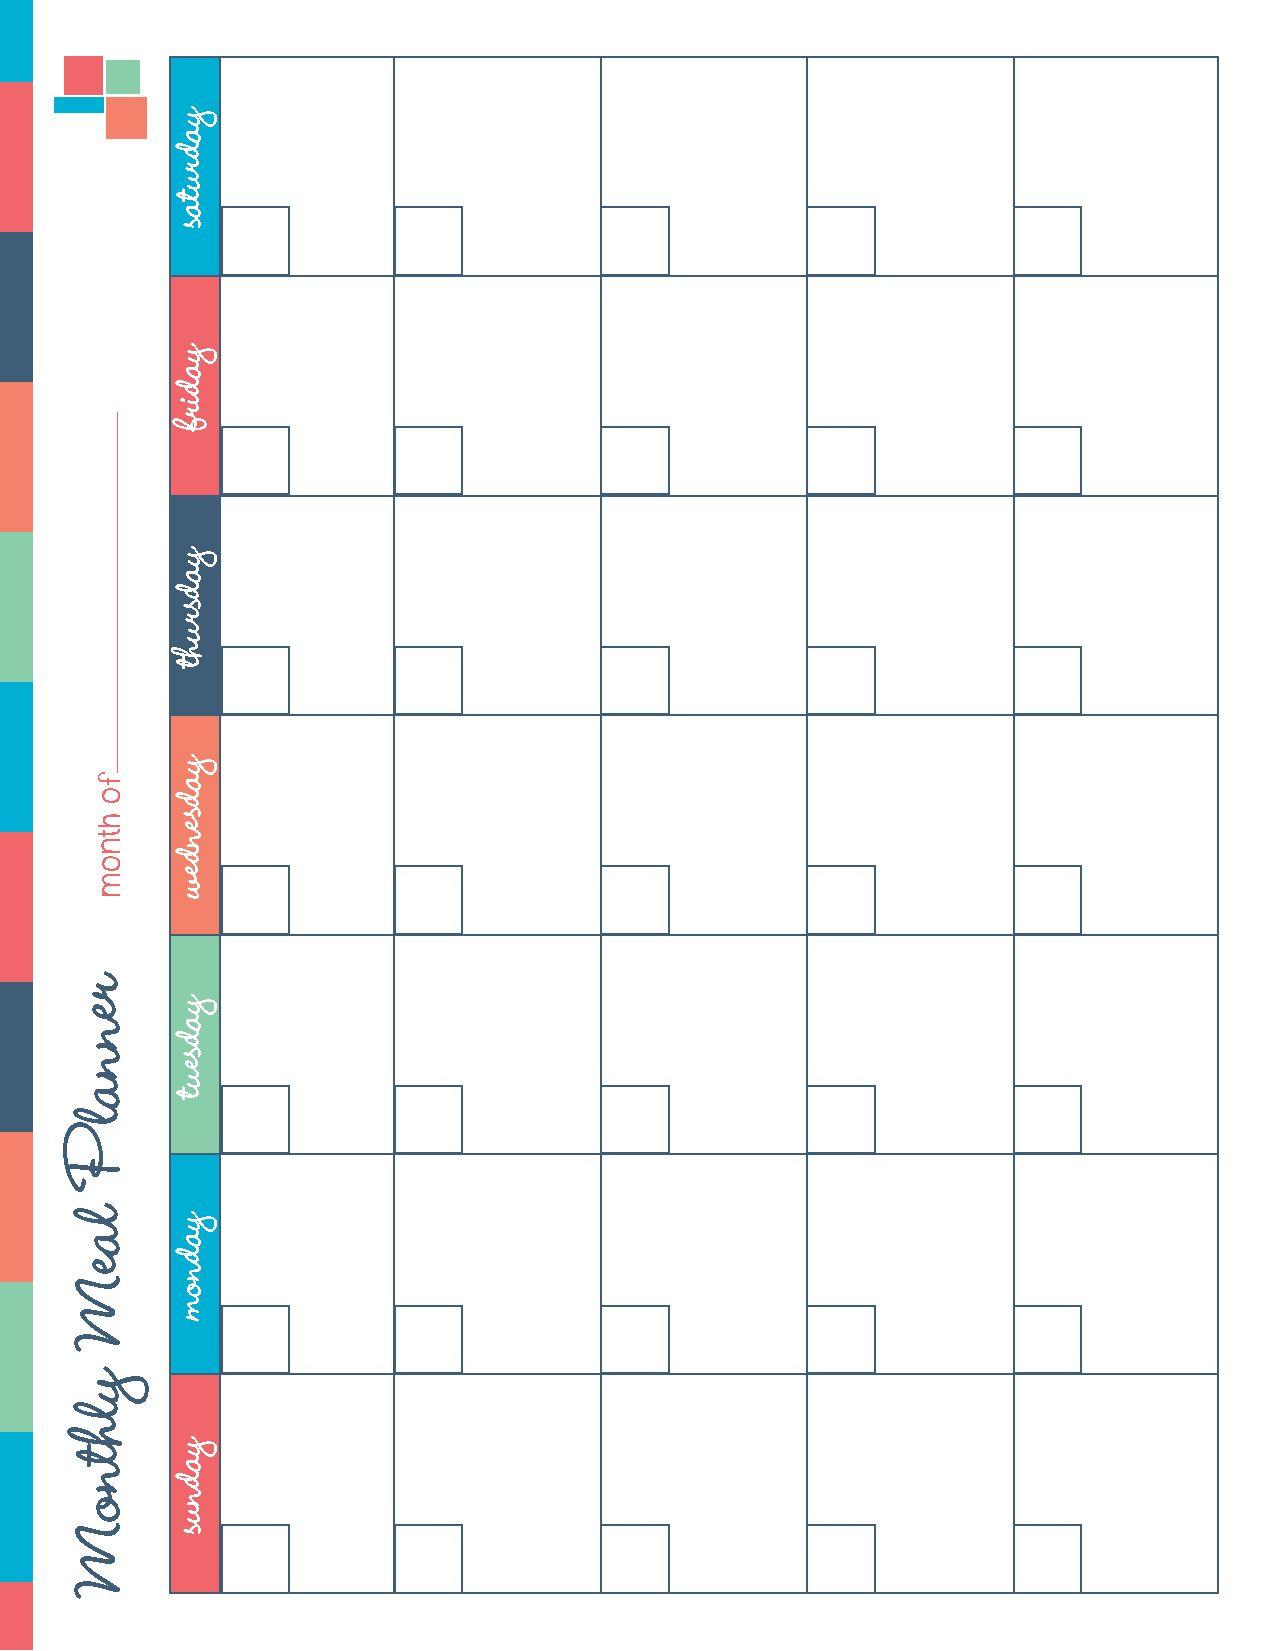 Free Printable Meal Planner Kitchen Set   Recipes   Meal Planner - Free Printable Monthly Meal Planner